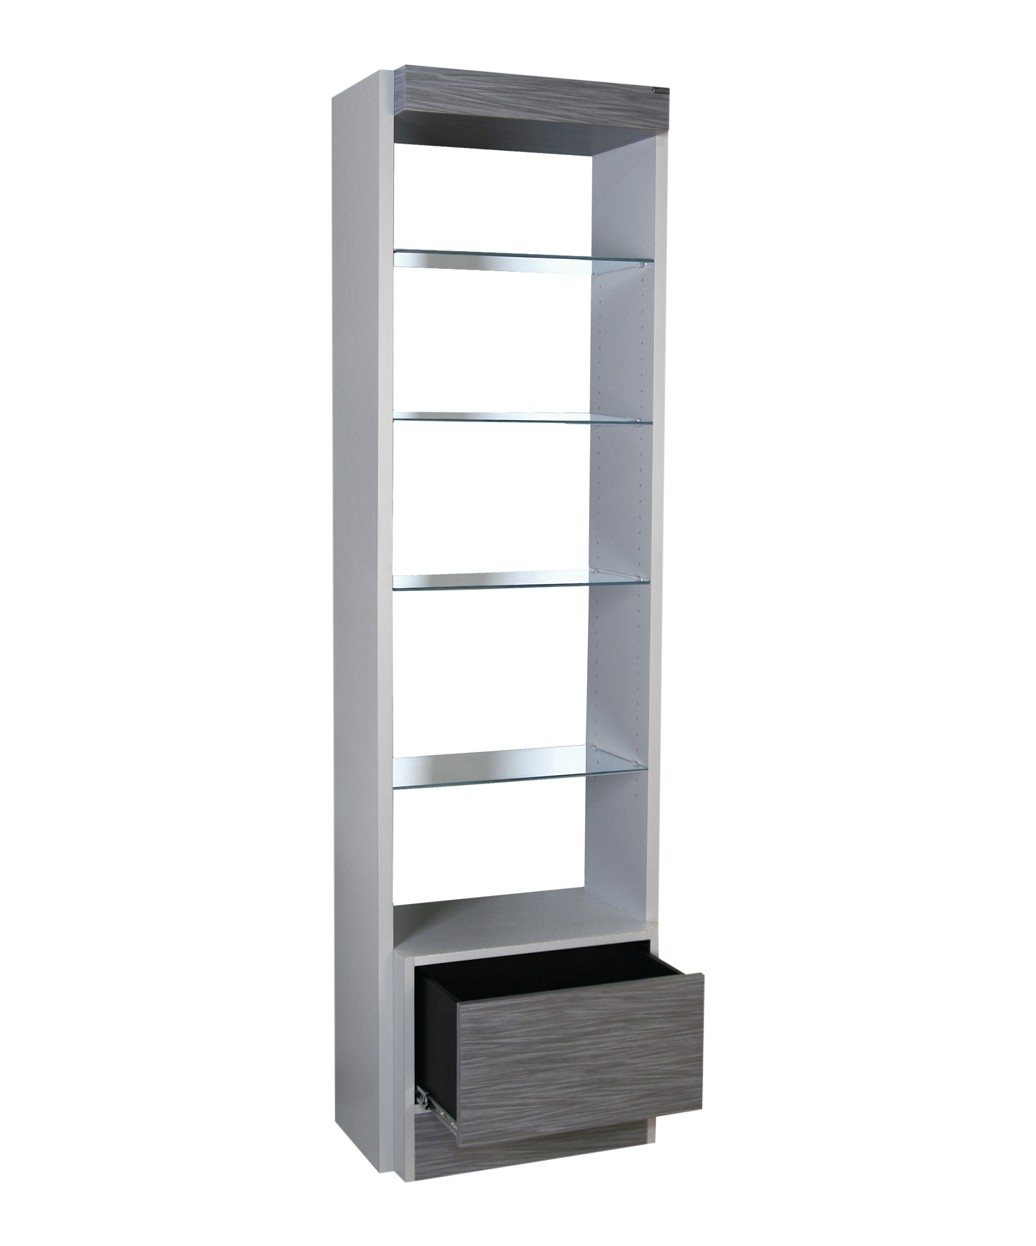 Collins 6629 Edge Retail Display Unit